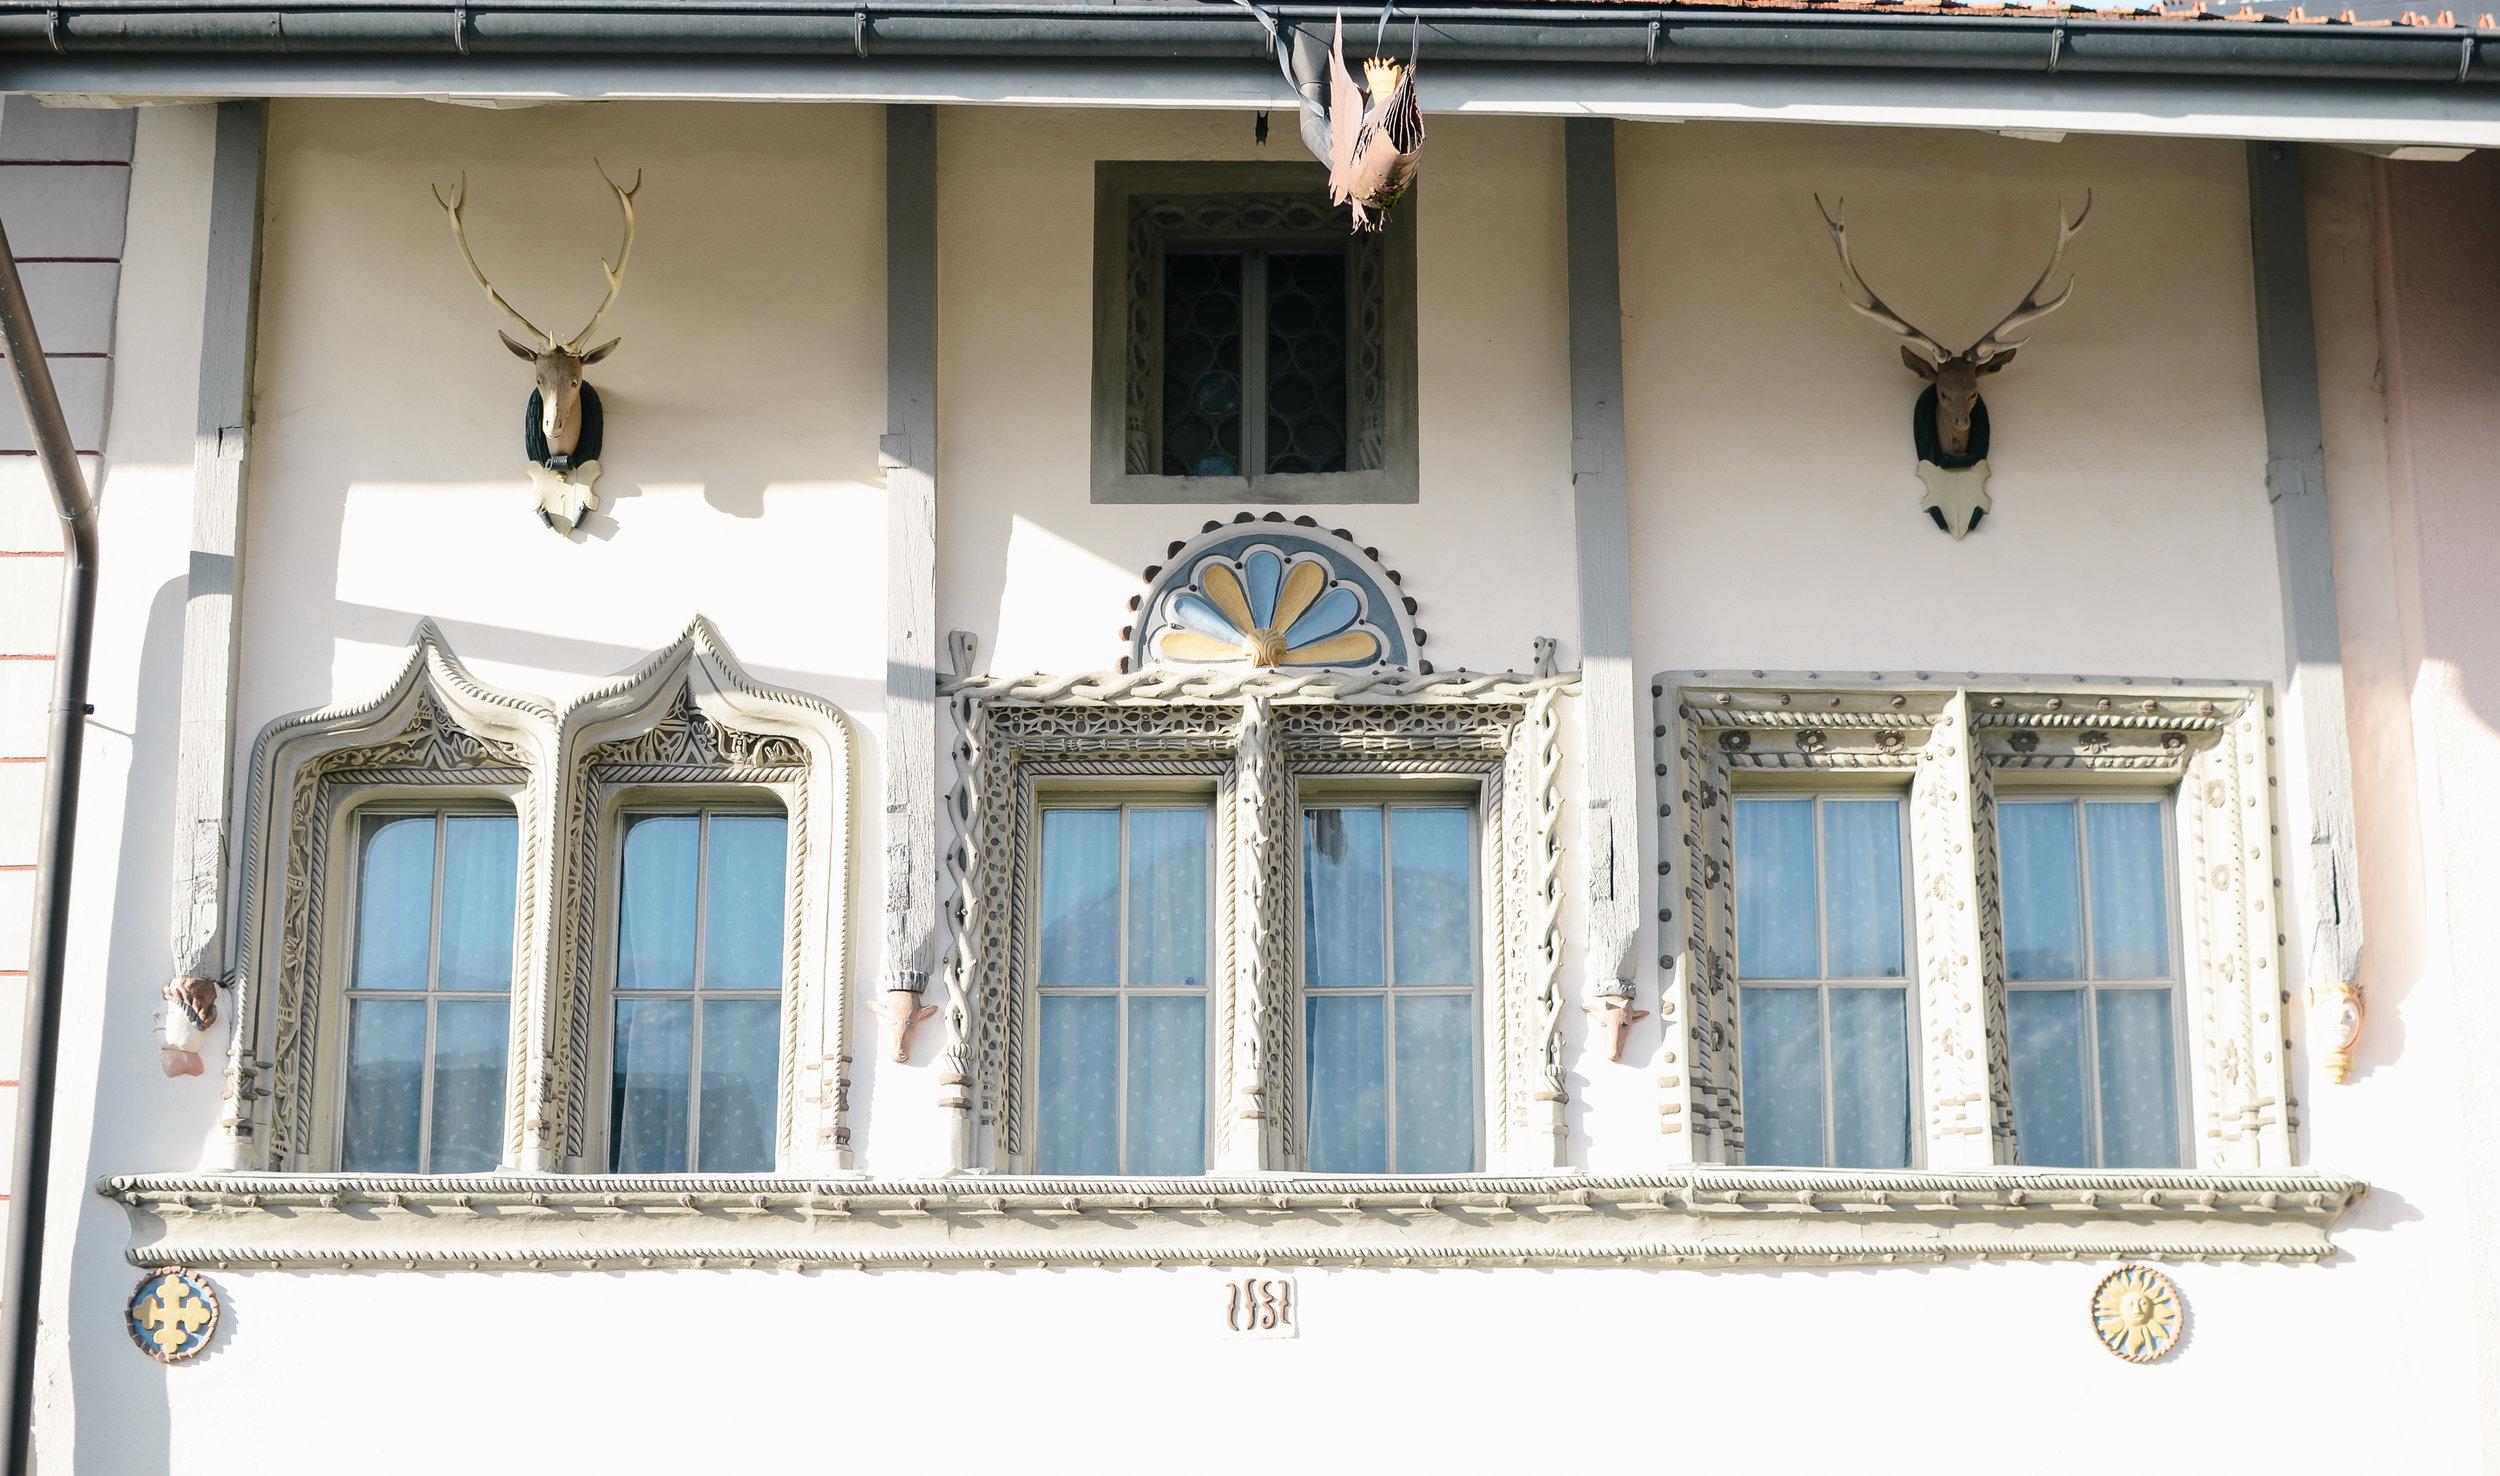 walls-of-switzerland-lifeonpine_DSC_0380.jpg